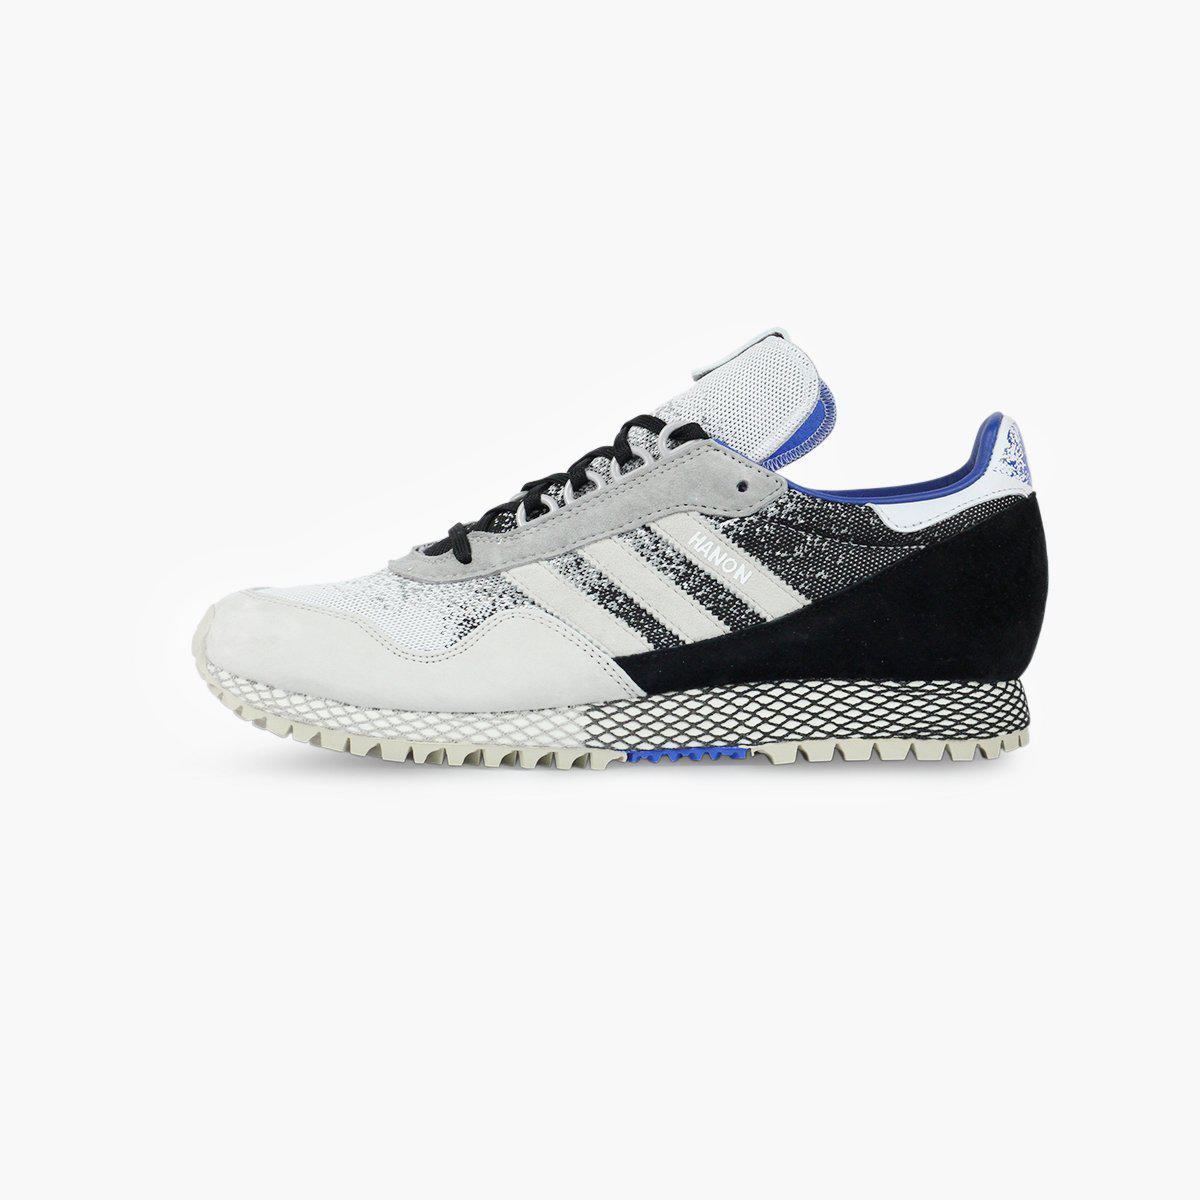 adidas Originals New York X Hanon for Men - Lyst e3b9a5ae4